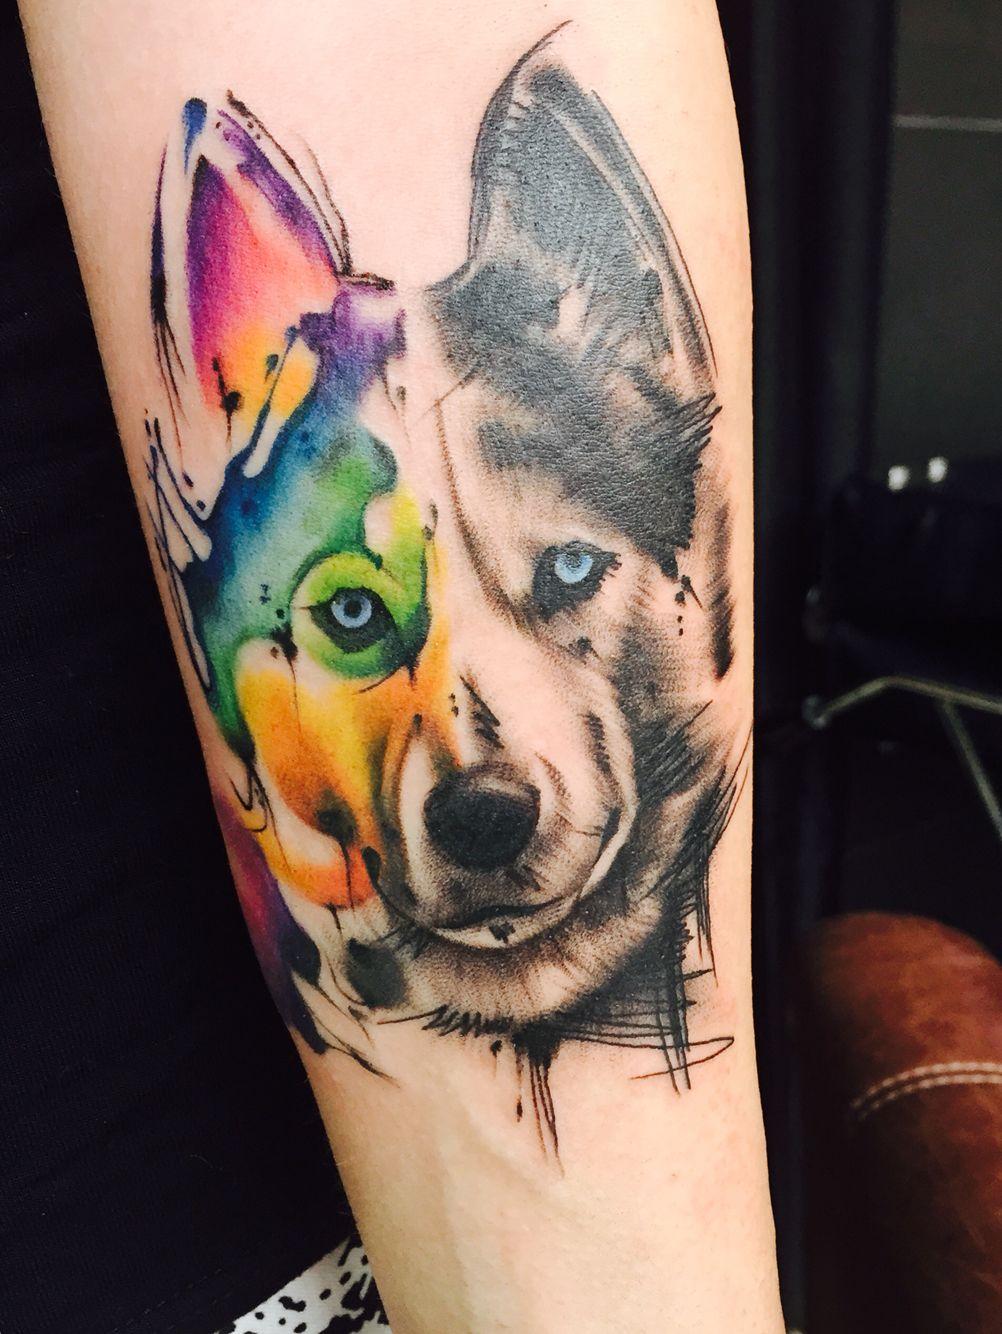 husky wolf watercolour tattoo art tattoo pinterest watercolour tattoos tattoo art and wolf. Black Bedroom Furniture Sets. Home Design Ideas